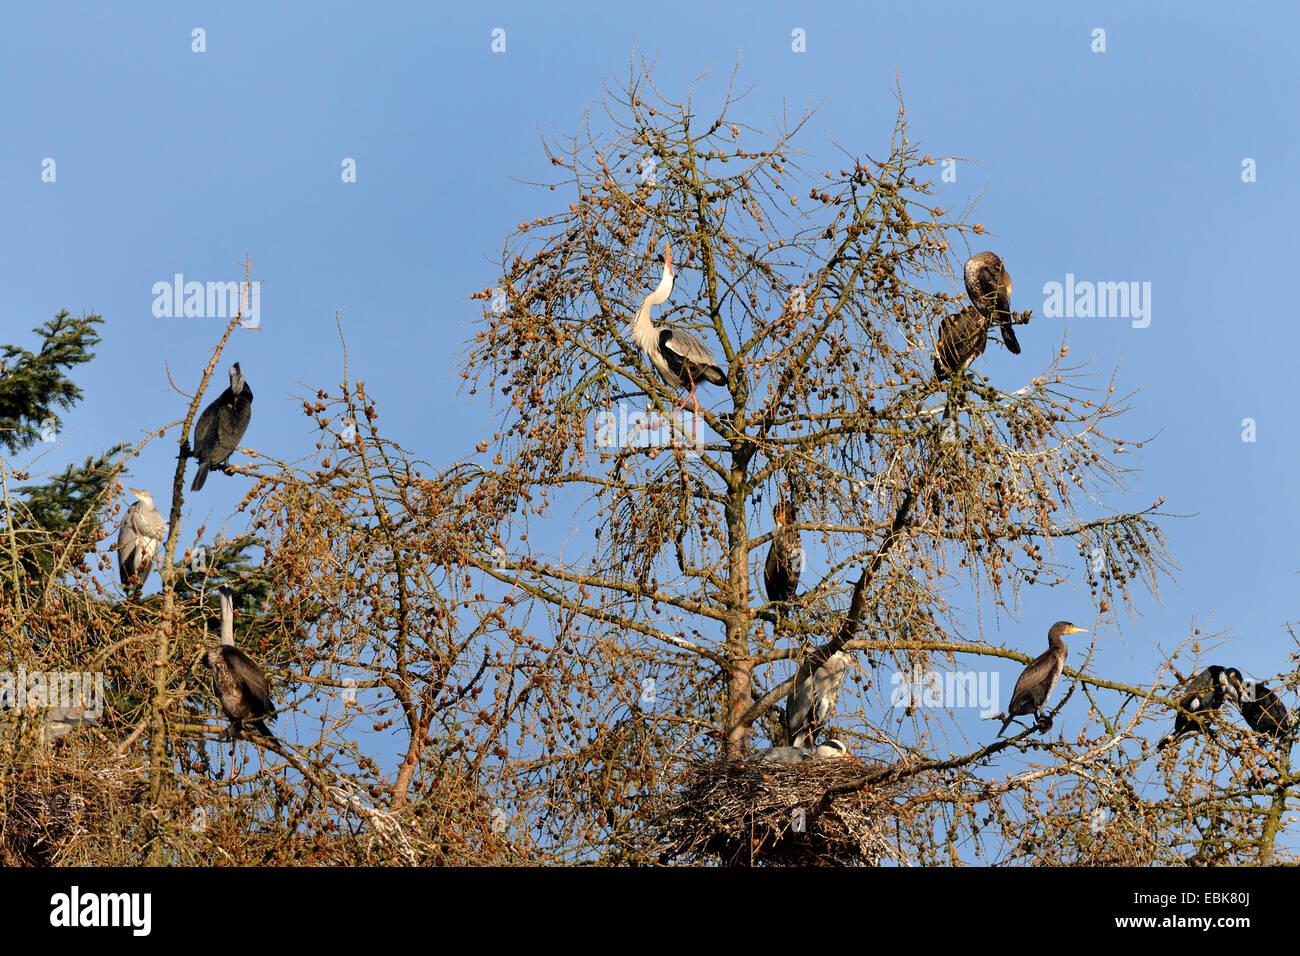 grey heron (Ardea cinerea), cormorans in a colony of grey herons in tree tops, Germany - Stock Image